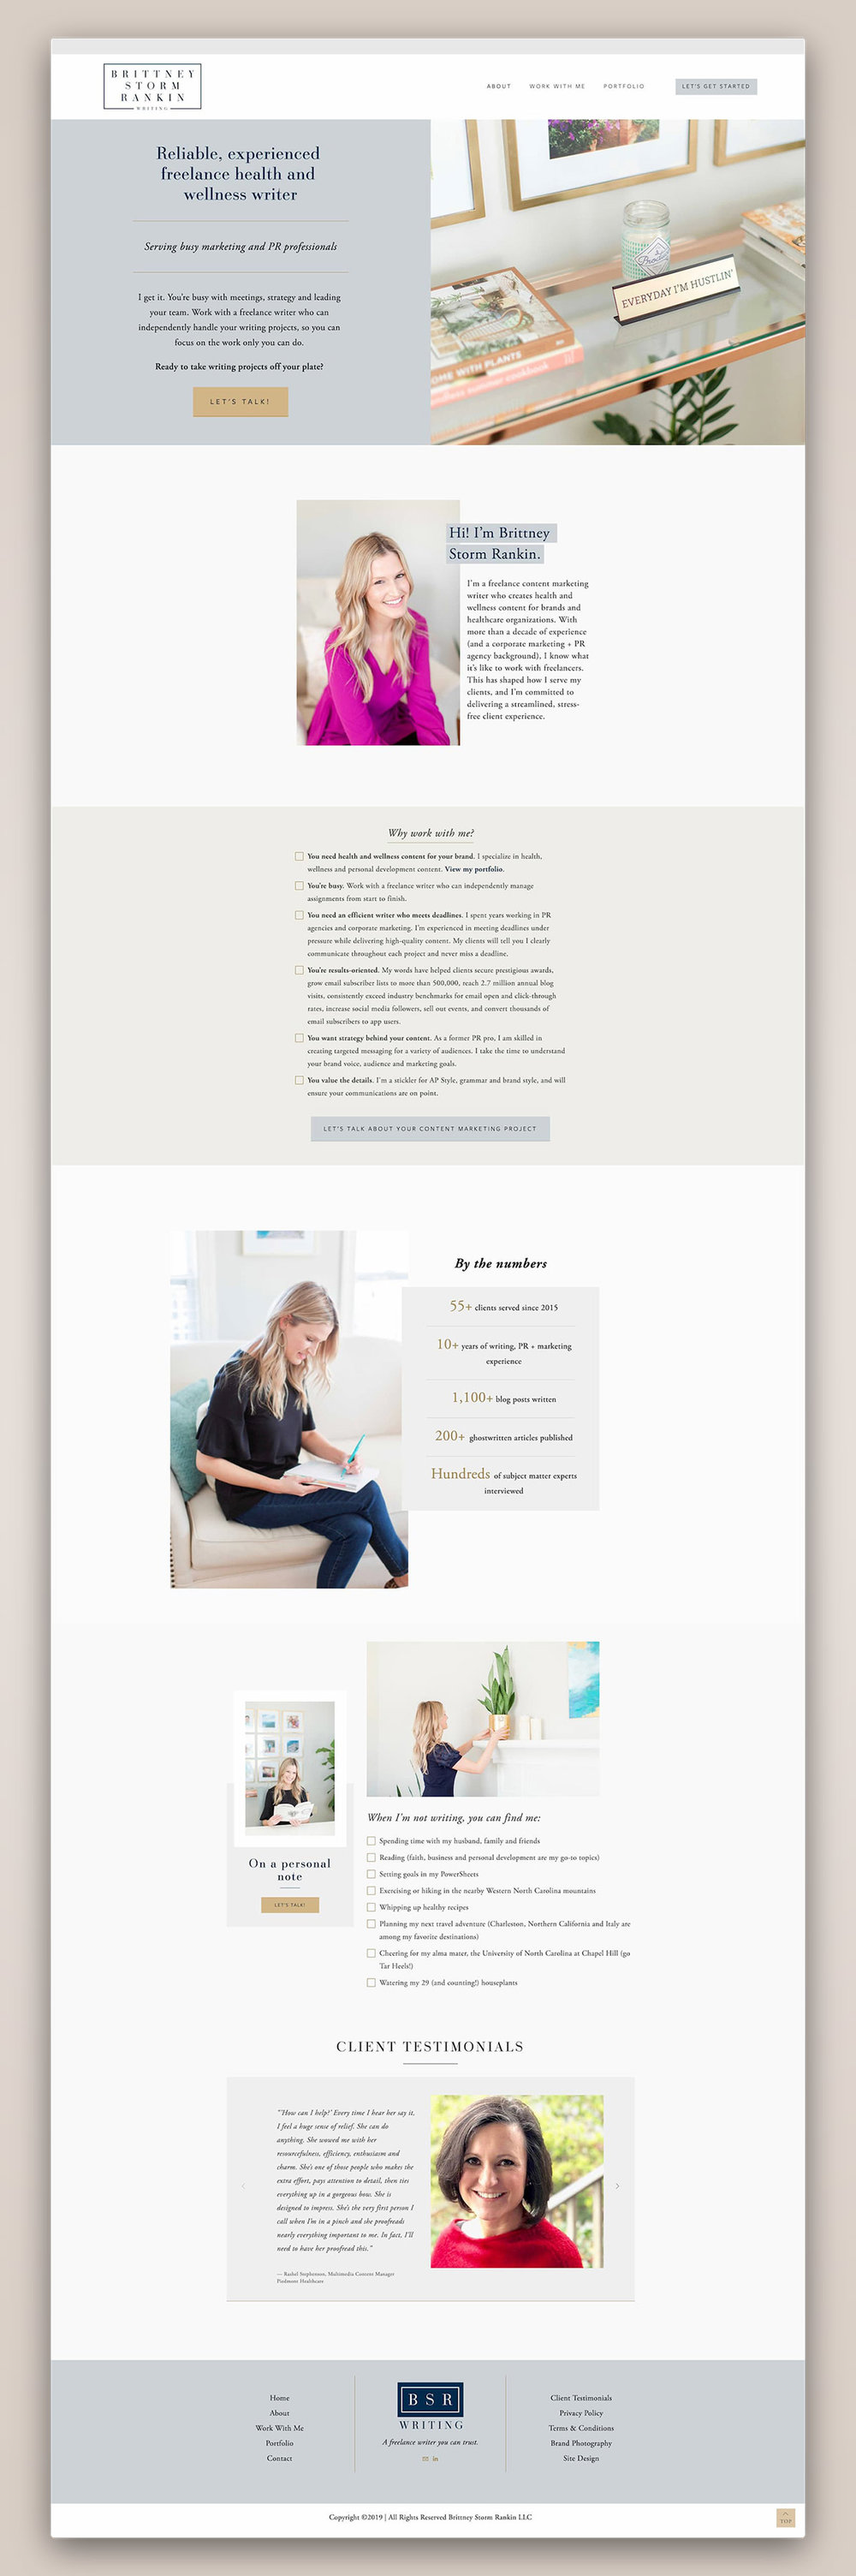 About page Brittney Storm Ranking Writing _ Jodi Neufeld Design.jpg